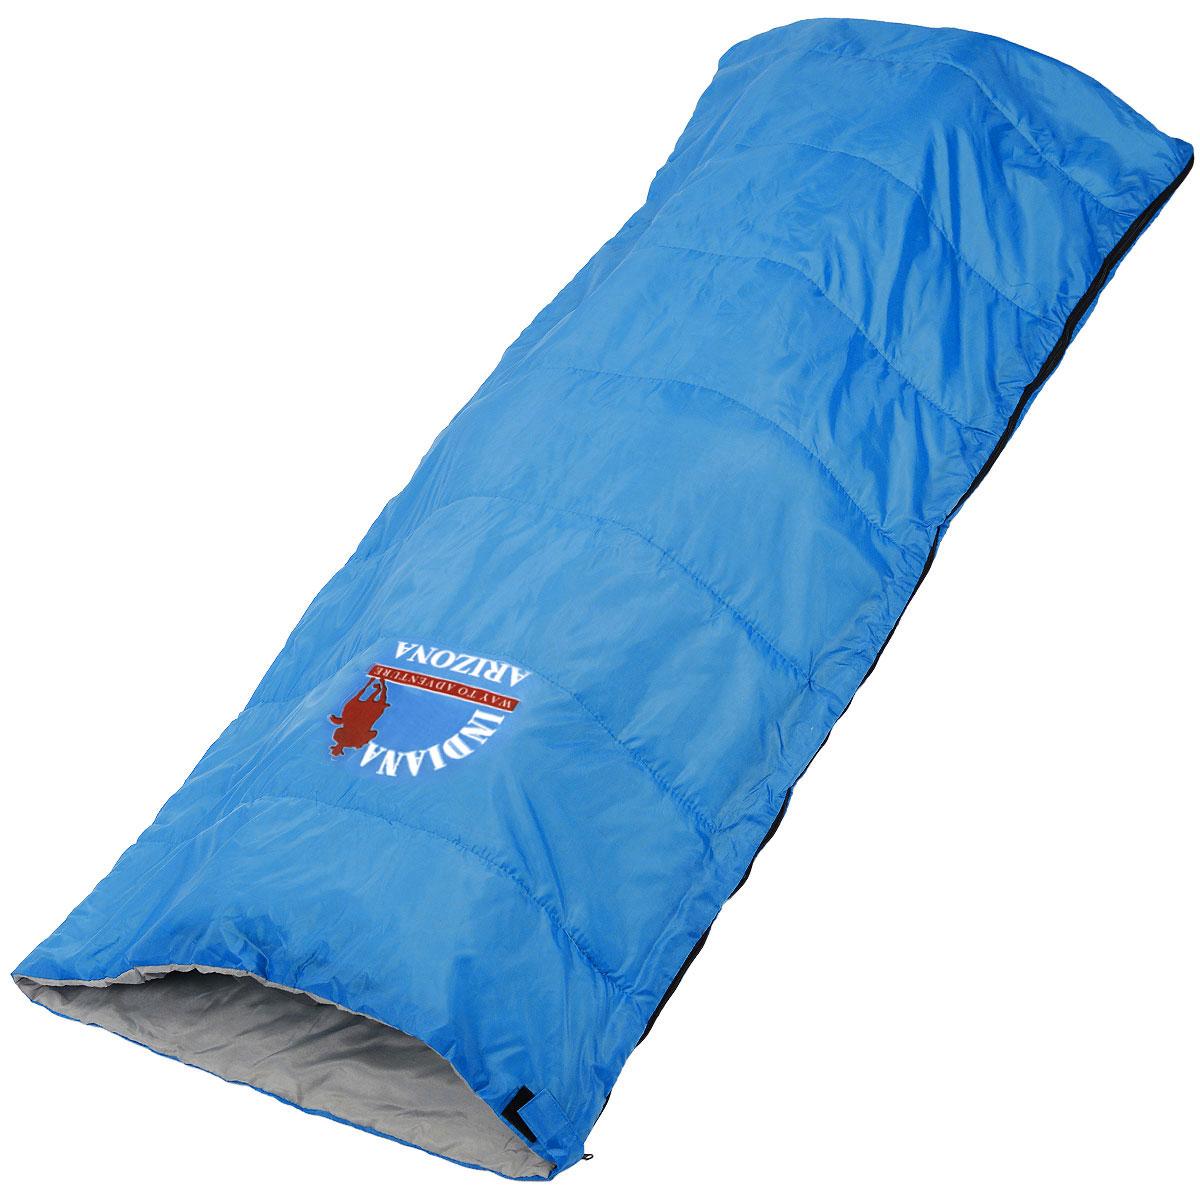 Спальный мешок-одеяло Indiana Arizona, 195 см х 85 см